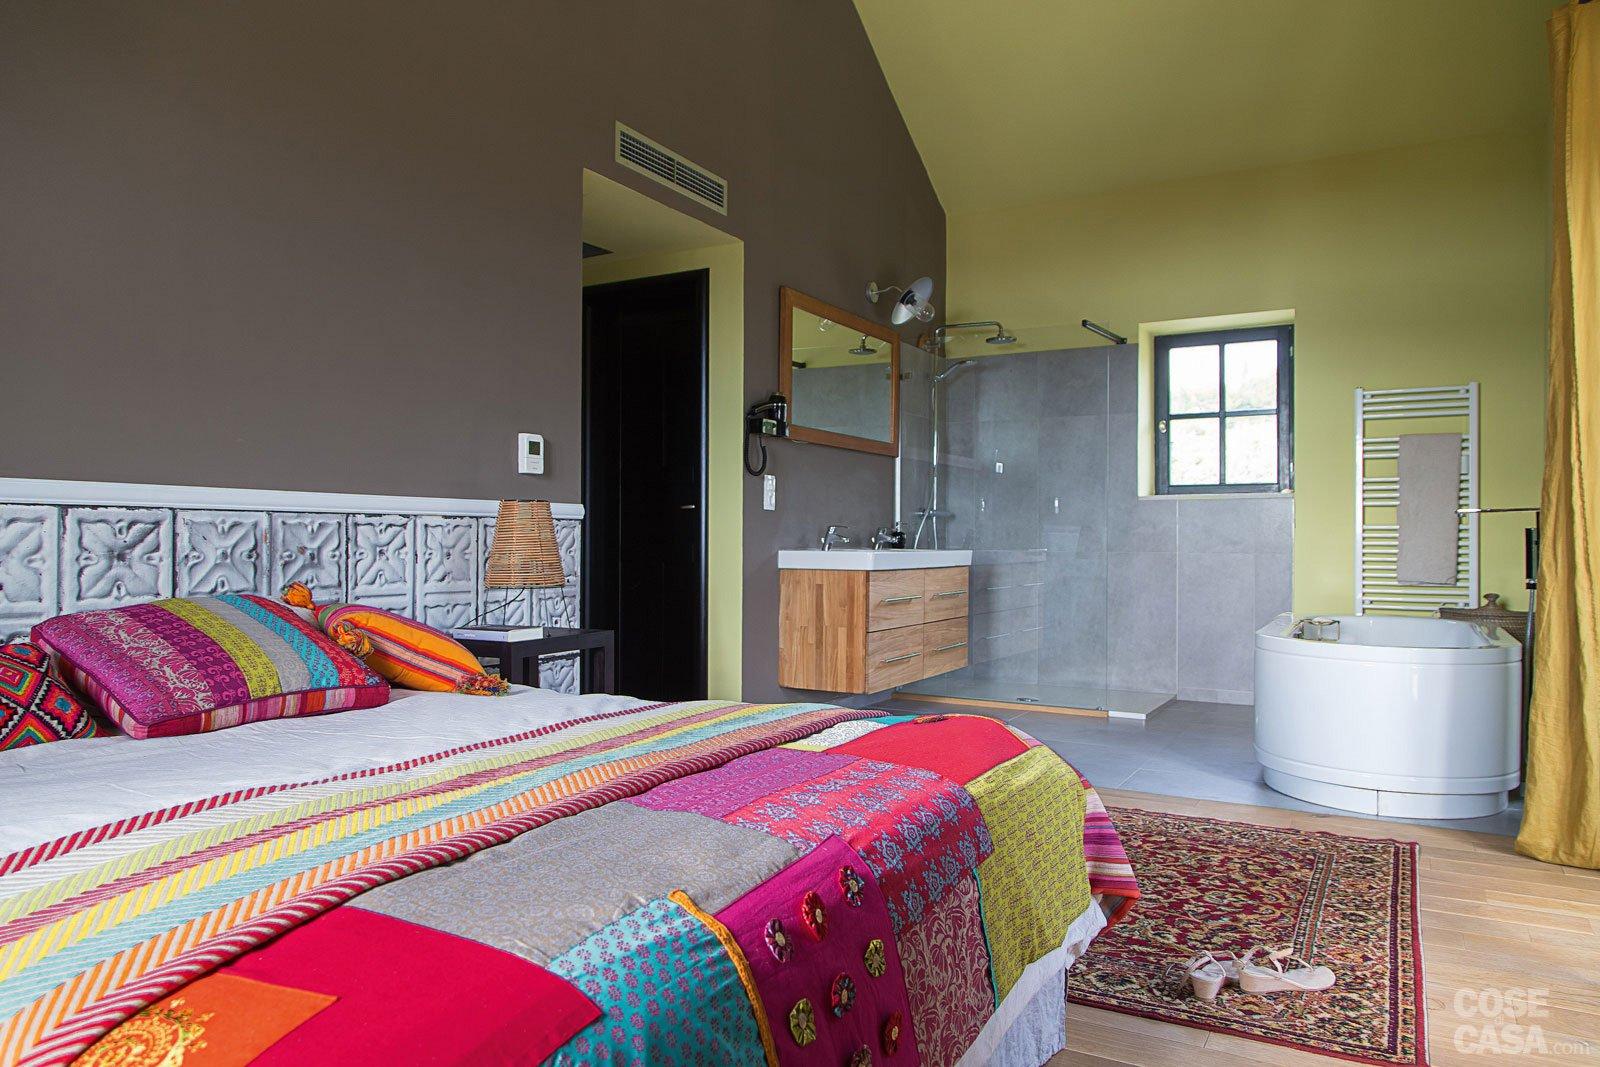 Barocco moderno - Esterno casa color tortora ...